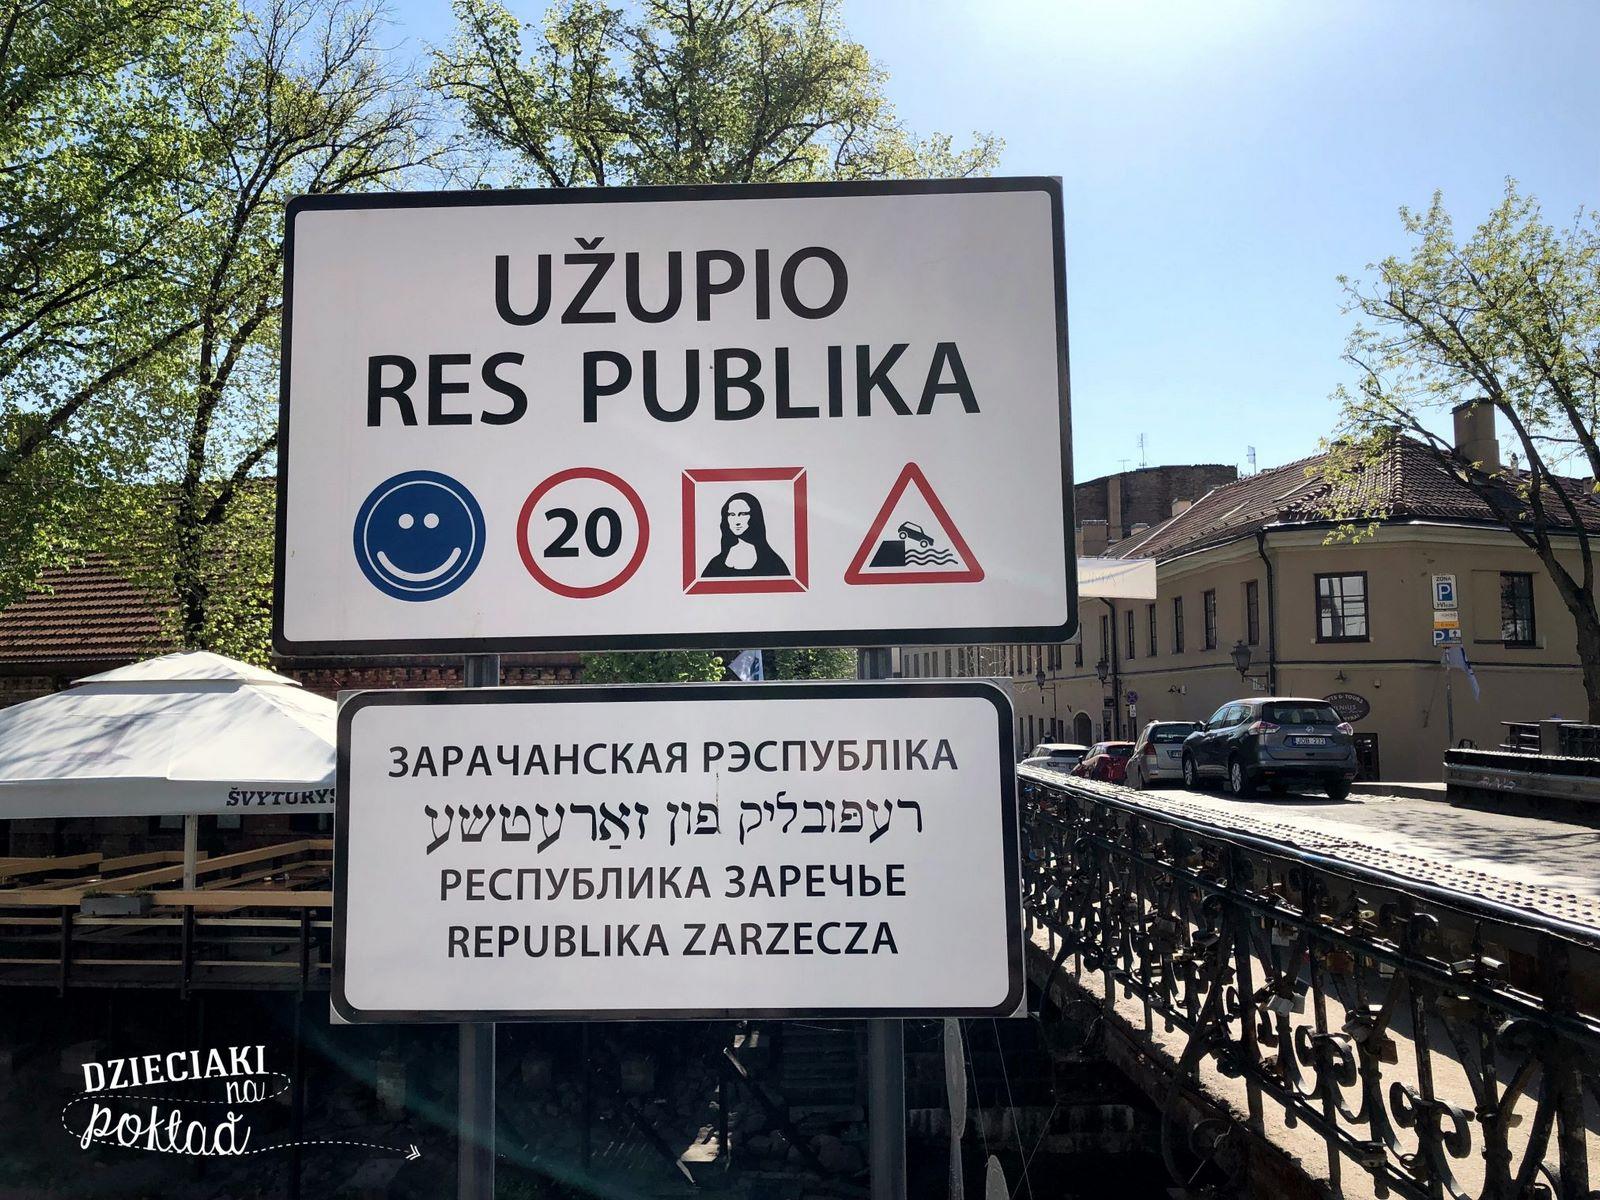 Litwa- Wilno, republika Uzupis